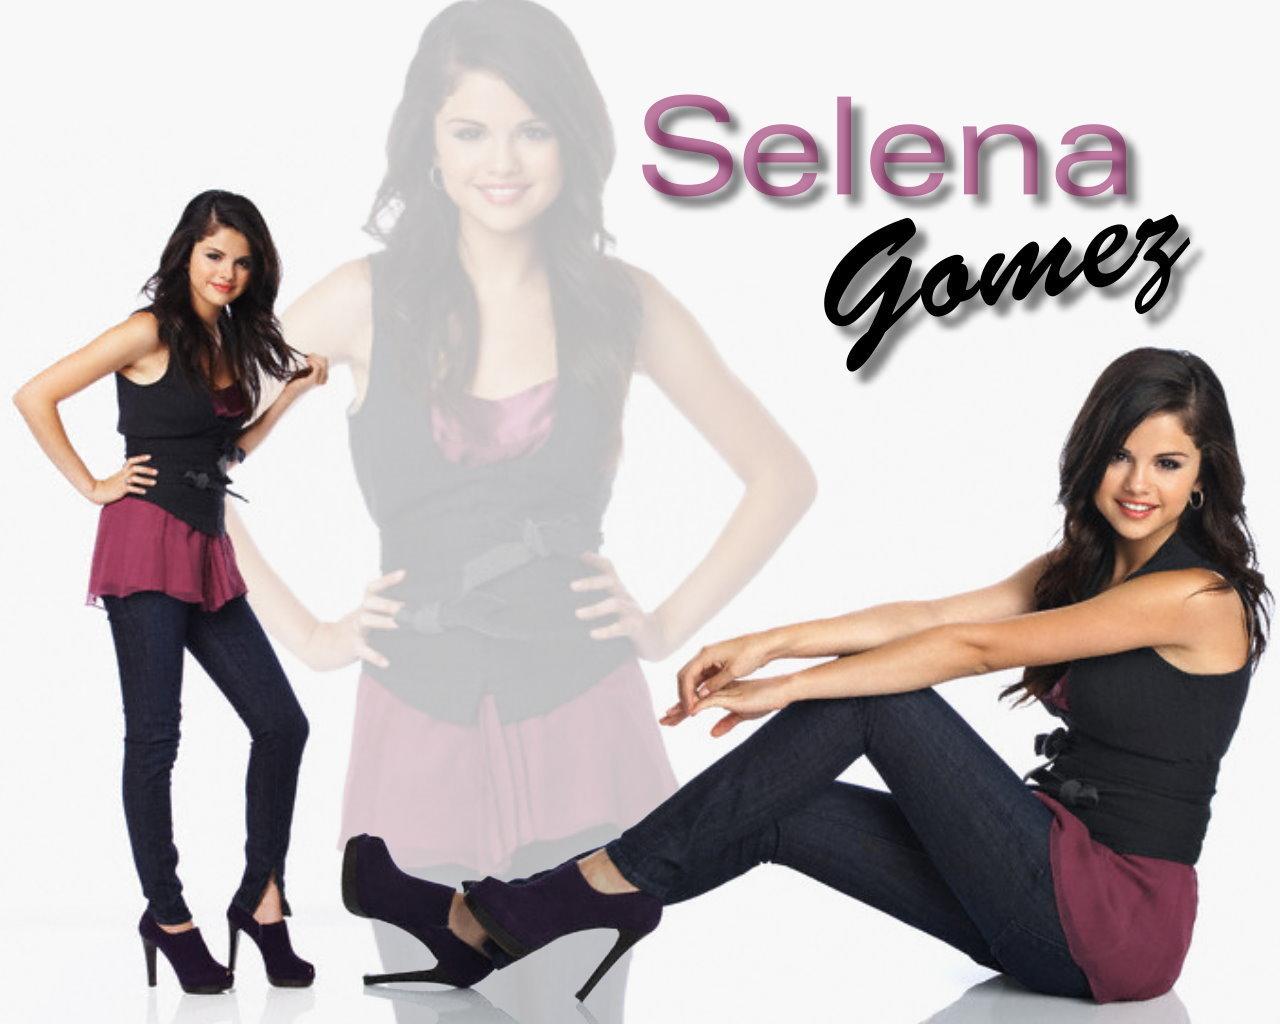 wallpaper selena gomez   Selena Gomez Wallpaper 6490339 1280x1024